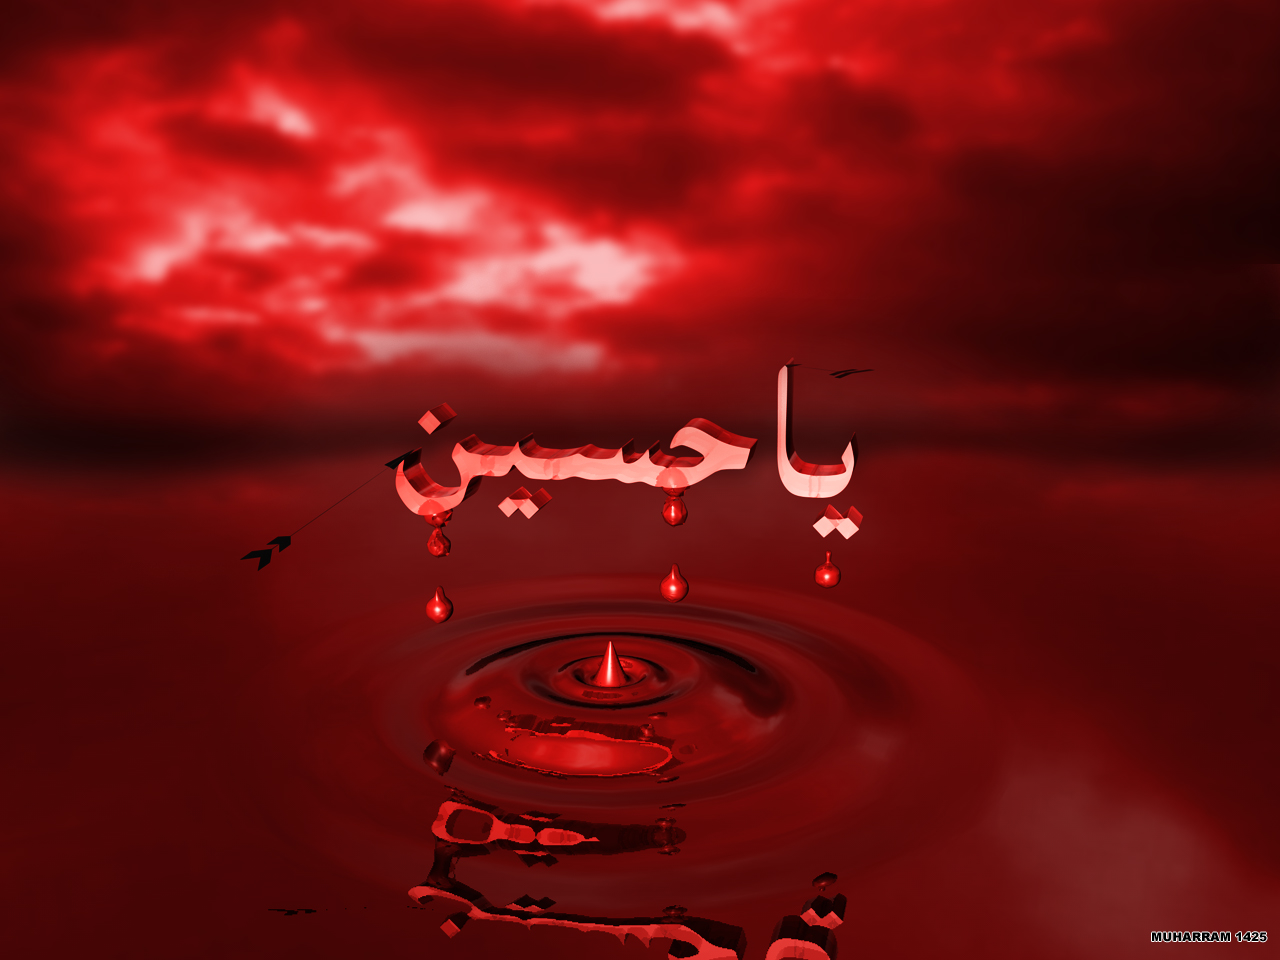 Free Download Wallpaper Ya Hussain 1280x960 For Your Desktop